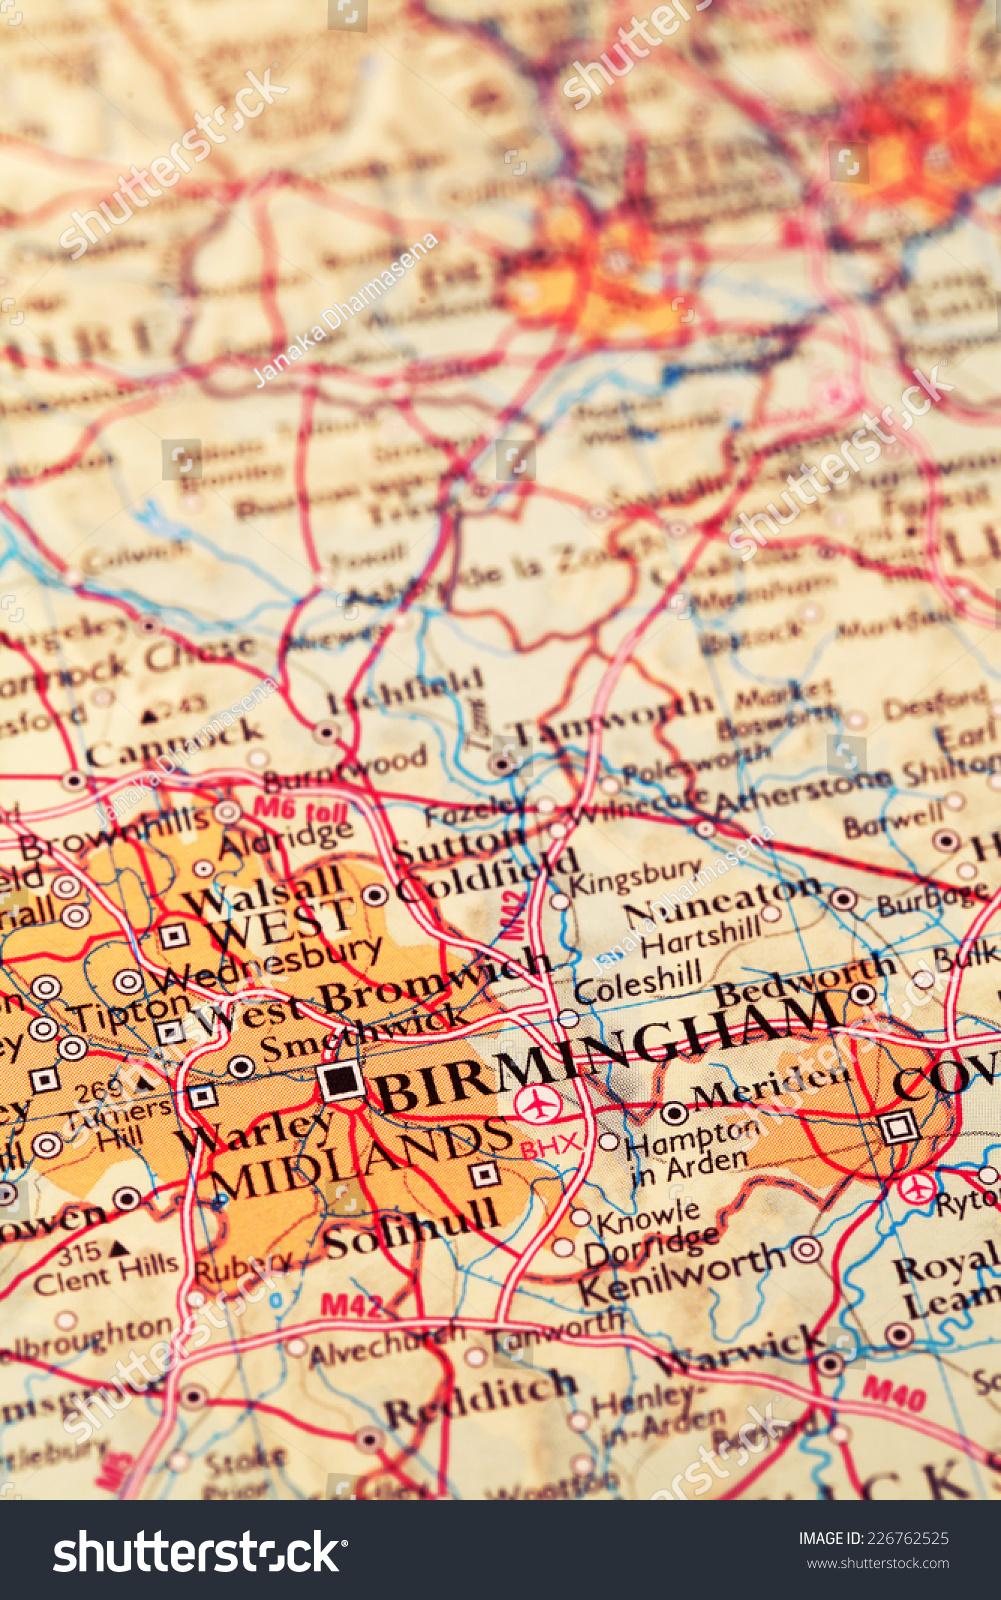 Birmingham City England On Atlas World Stock Photo Edit Now